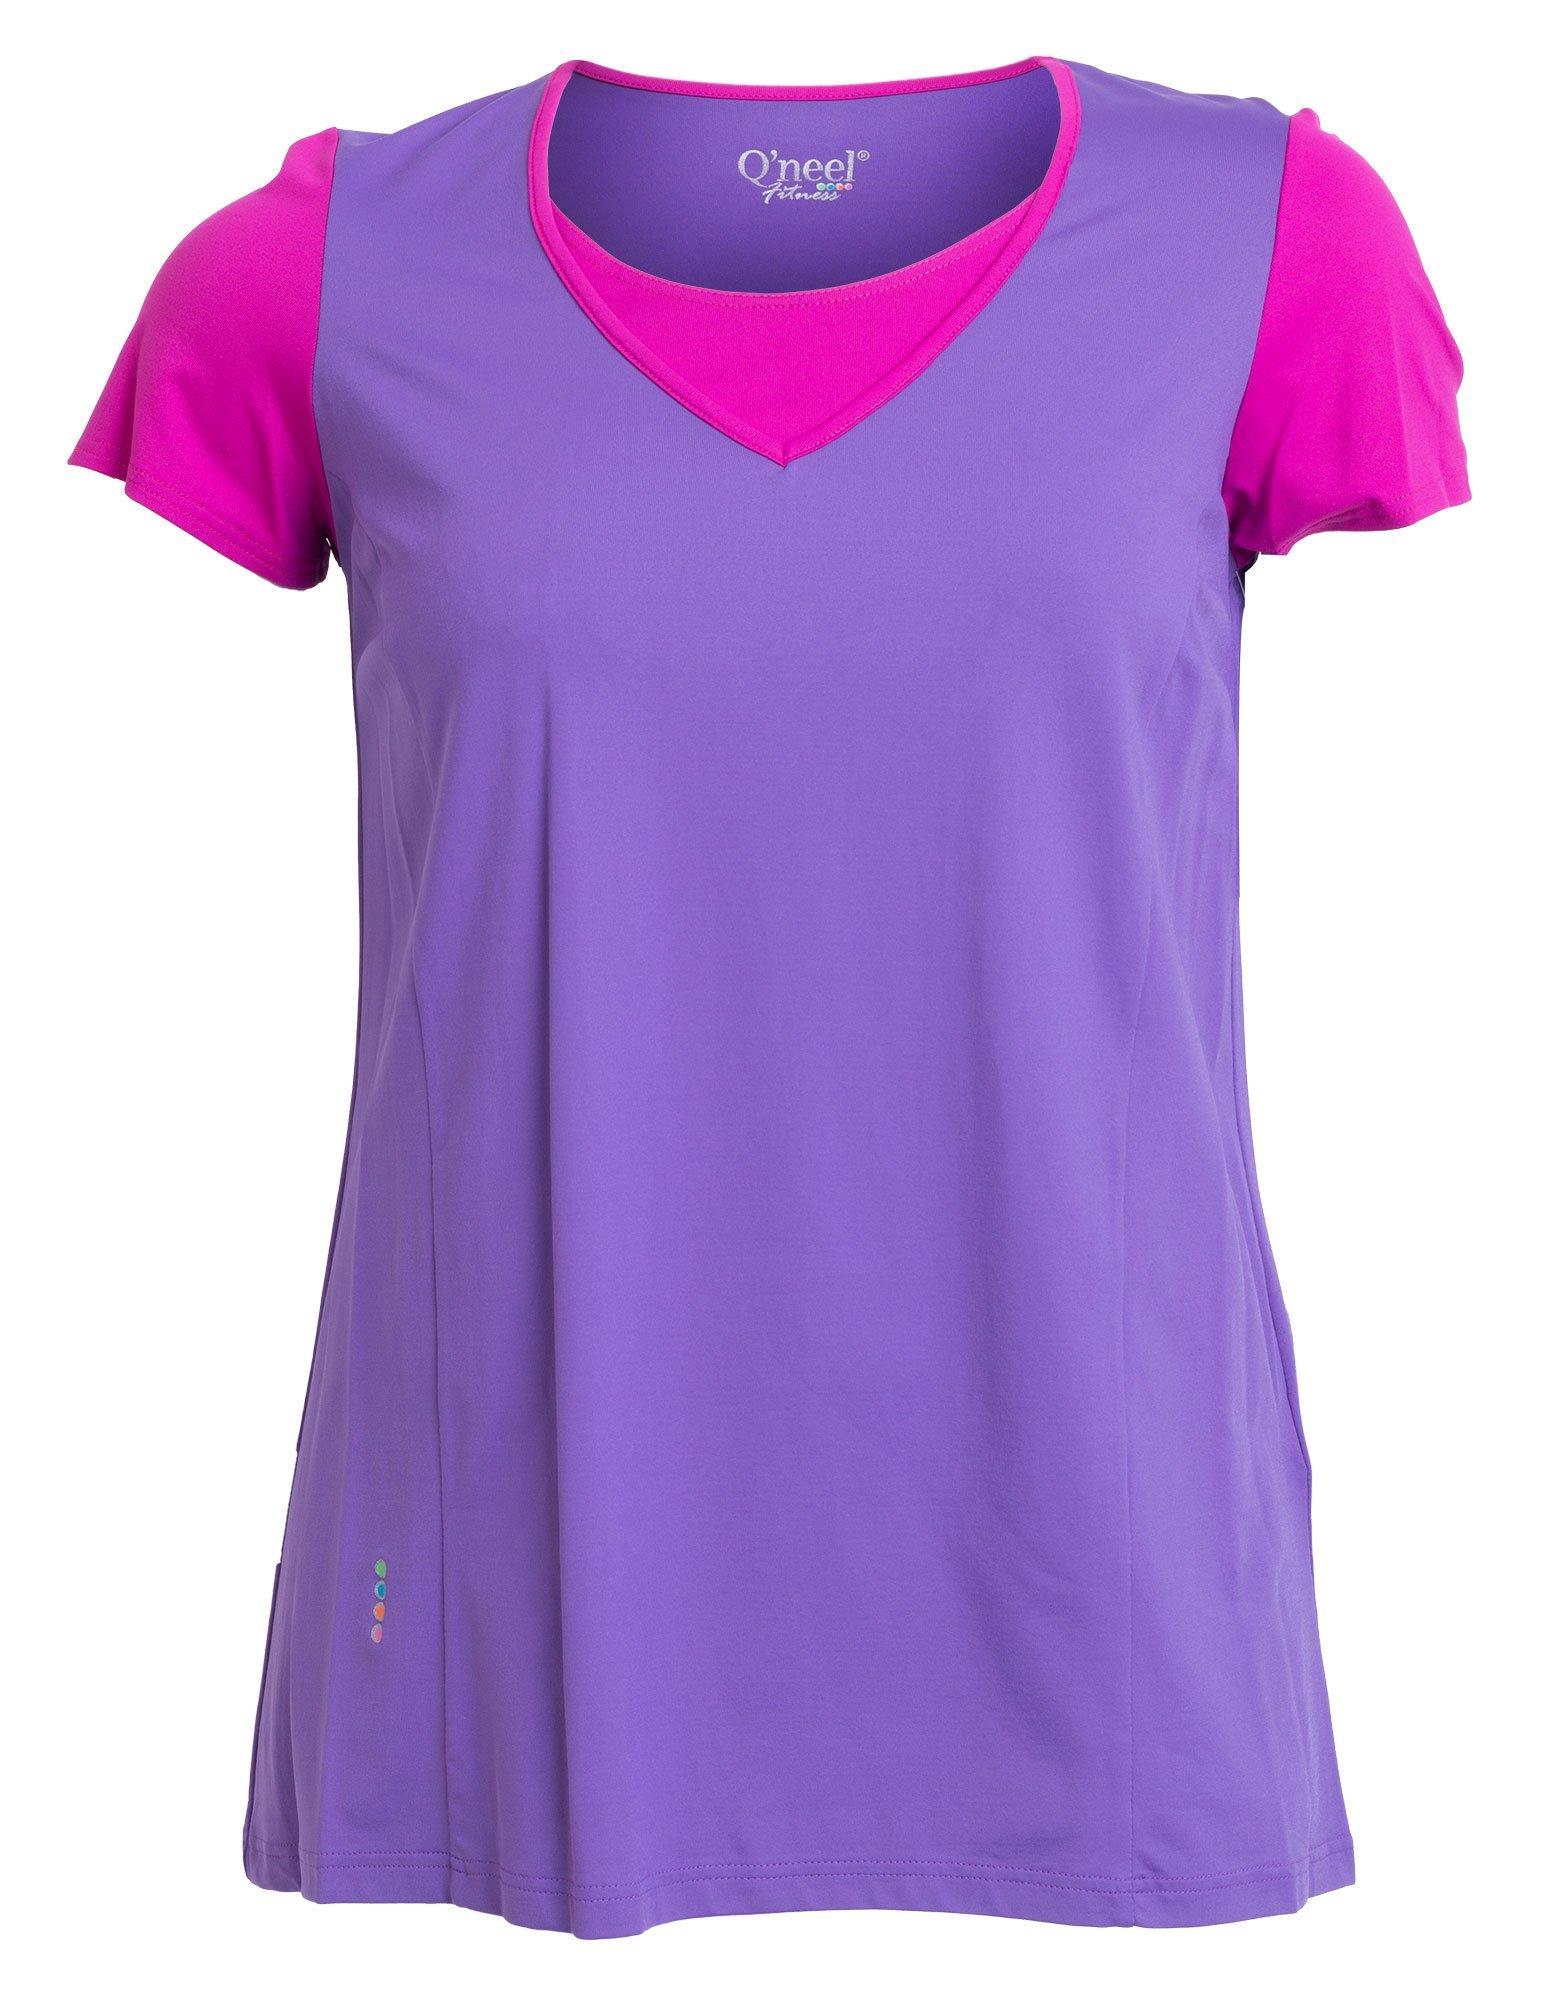 T-shirt til fitness i lilla og magenta